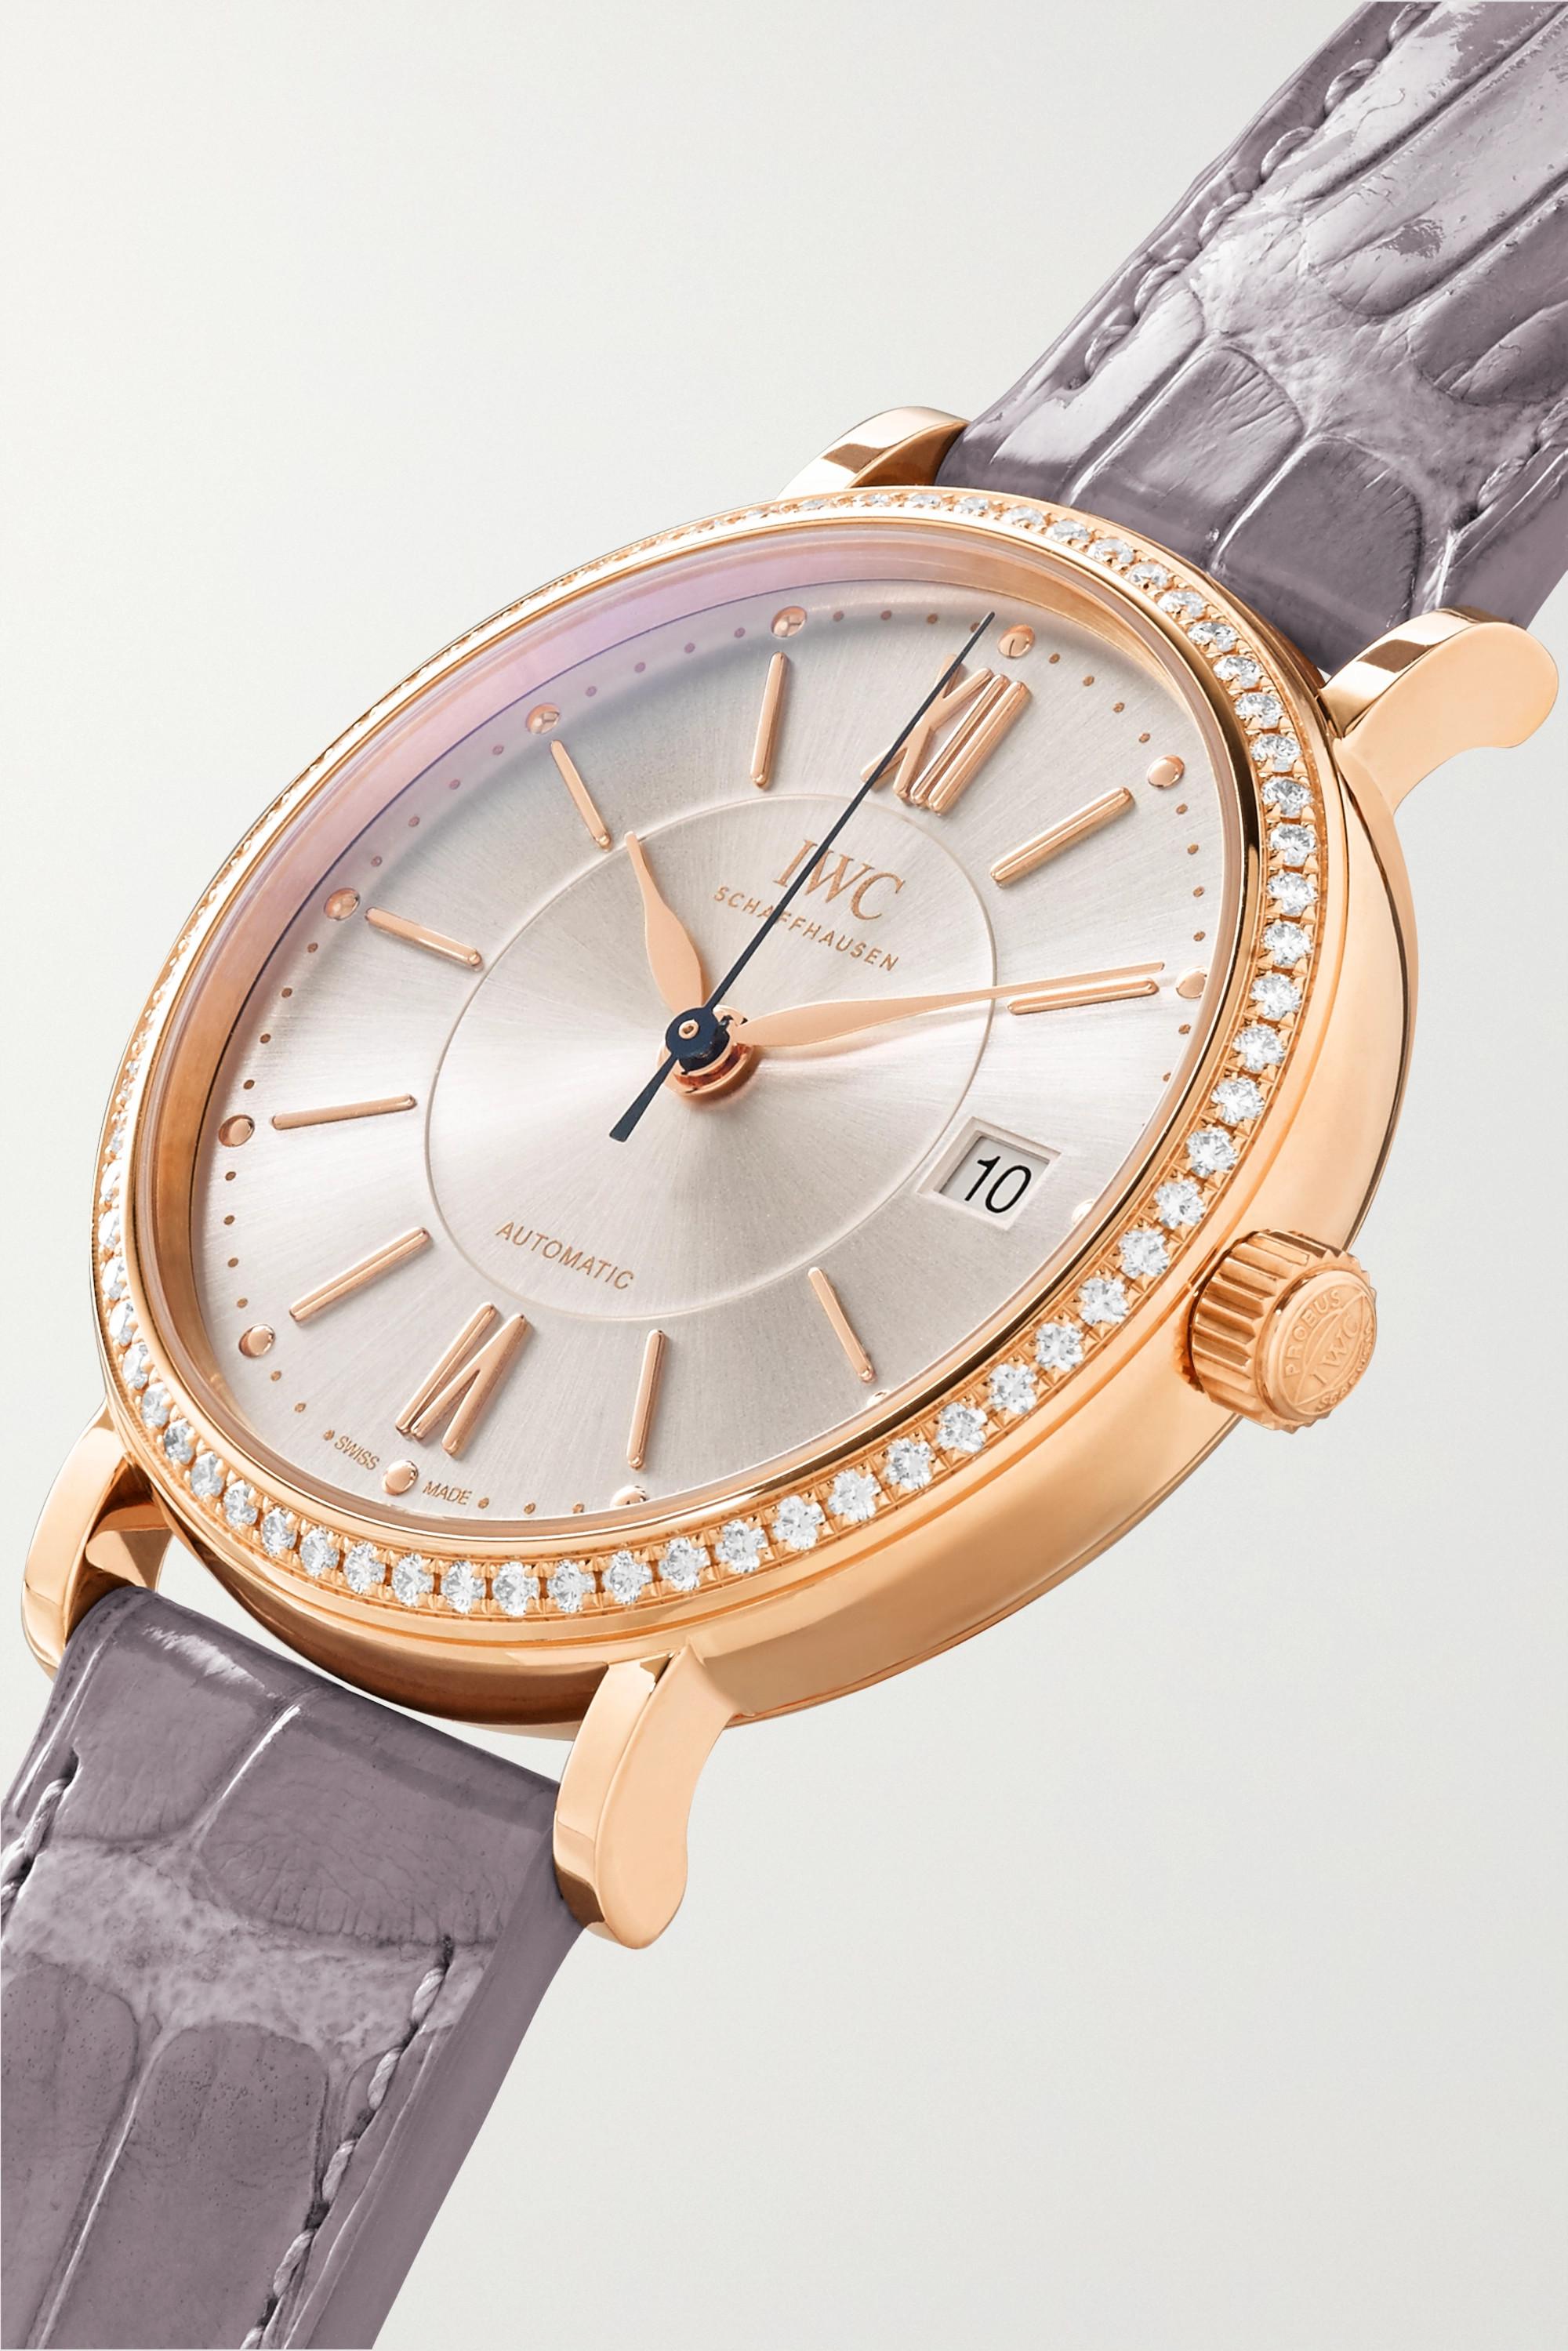 IWC SCHAFFHAUSEN Portofino Automatic 37mm 18-karat red gold, alligator and diamond watch